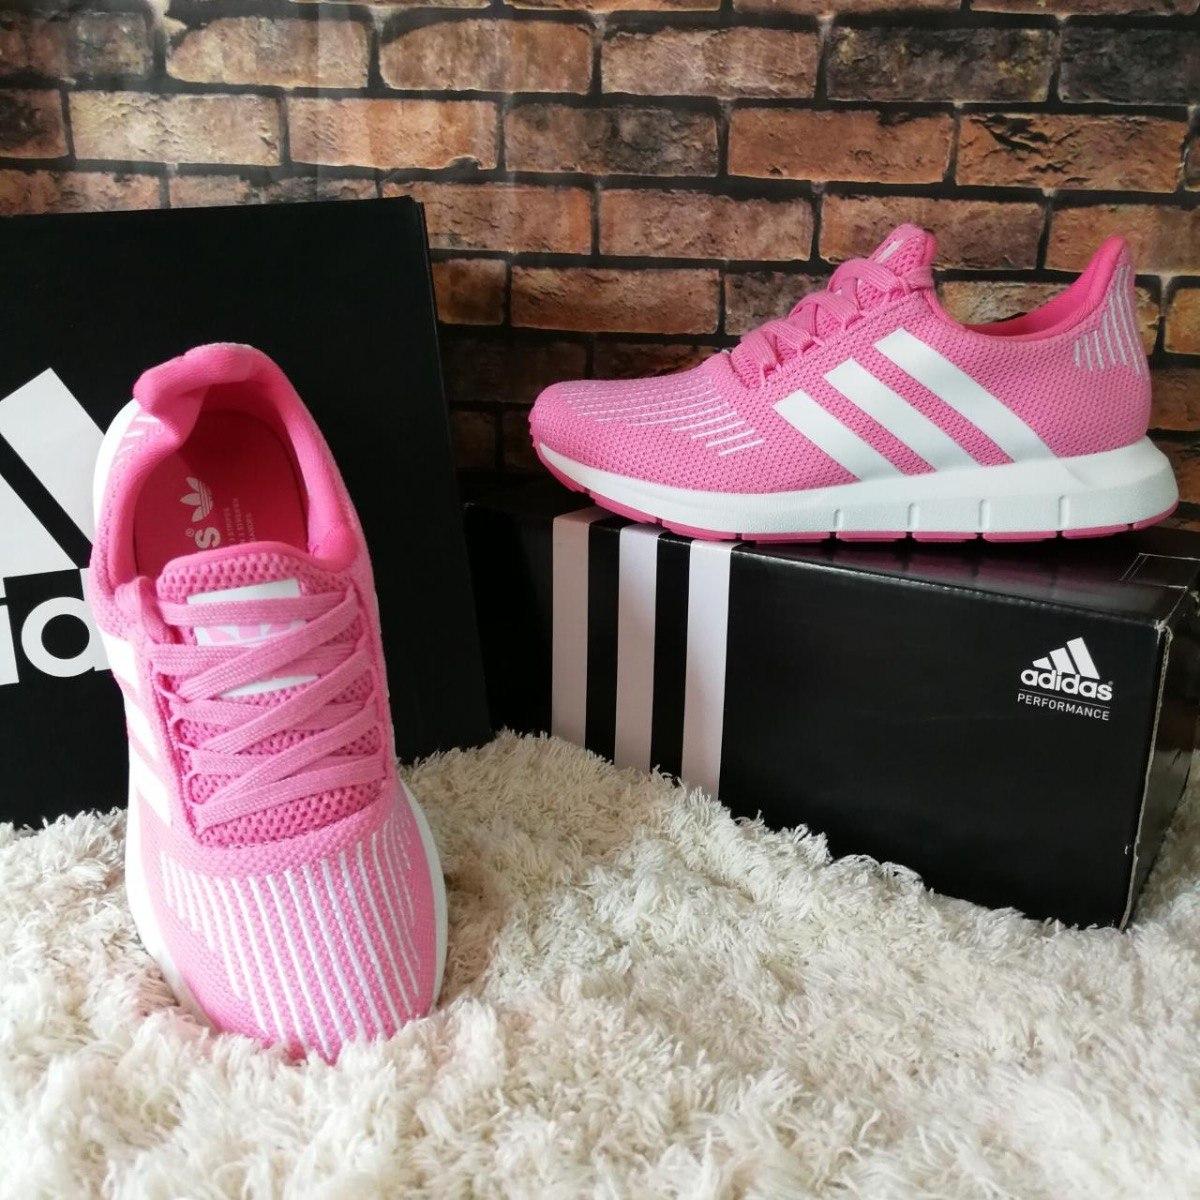 22d80f1067025 tenis zapatillas adidas swift run rosada blanca mujer env gr. Cargando zoom.